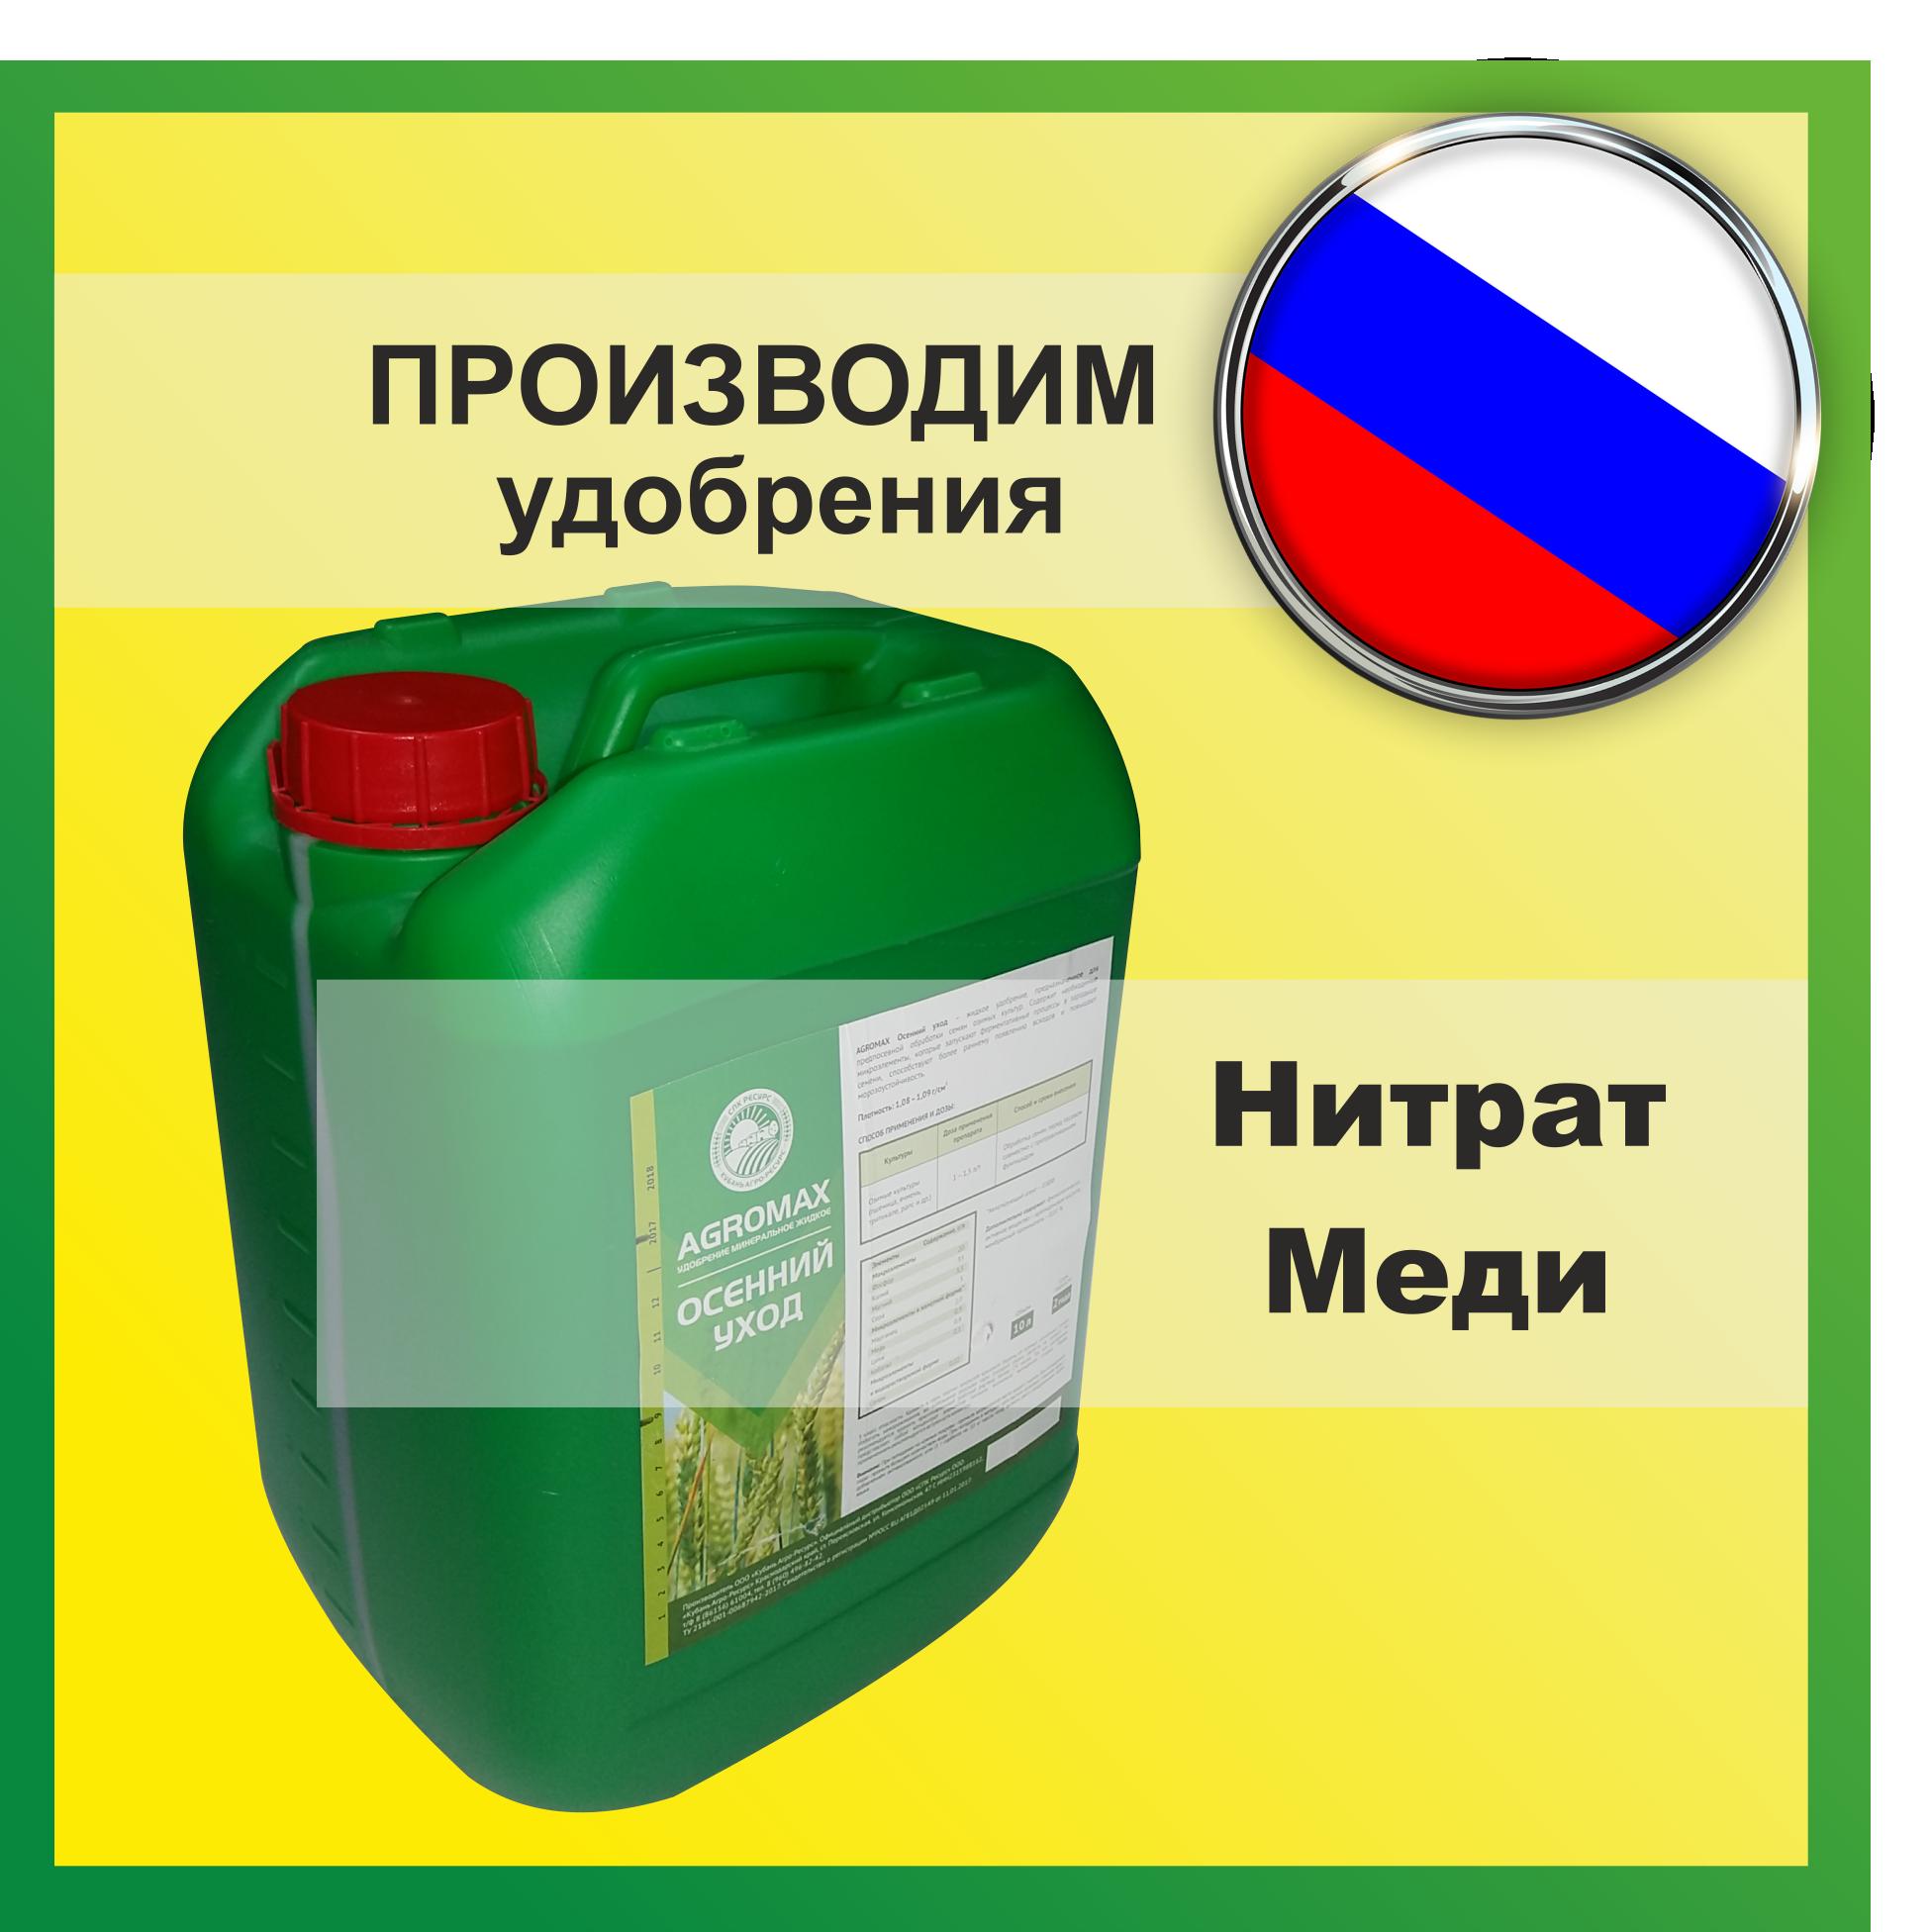 Nitrat-Medi-udobrenie-agromaks-1-1